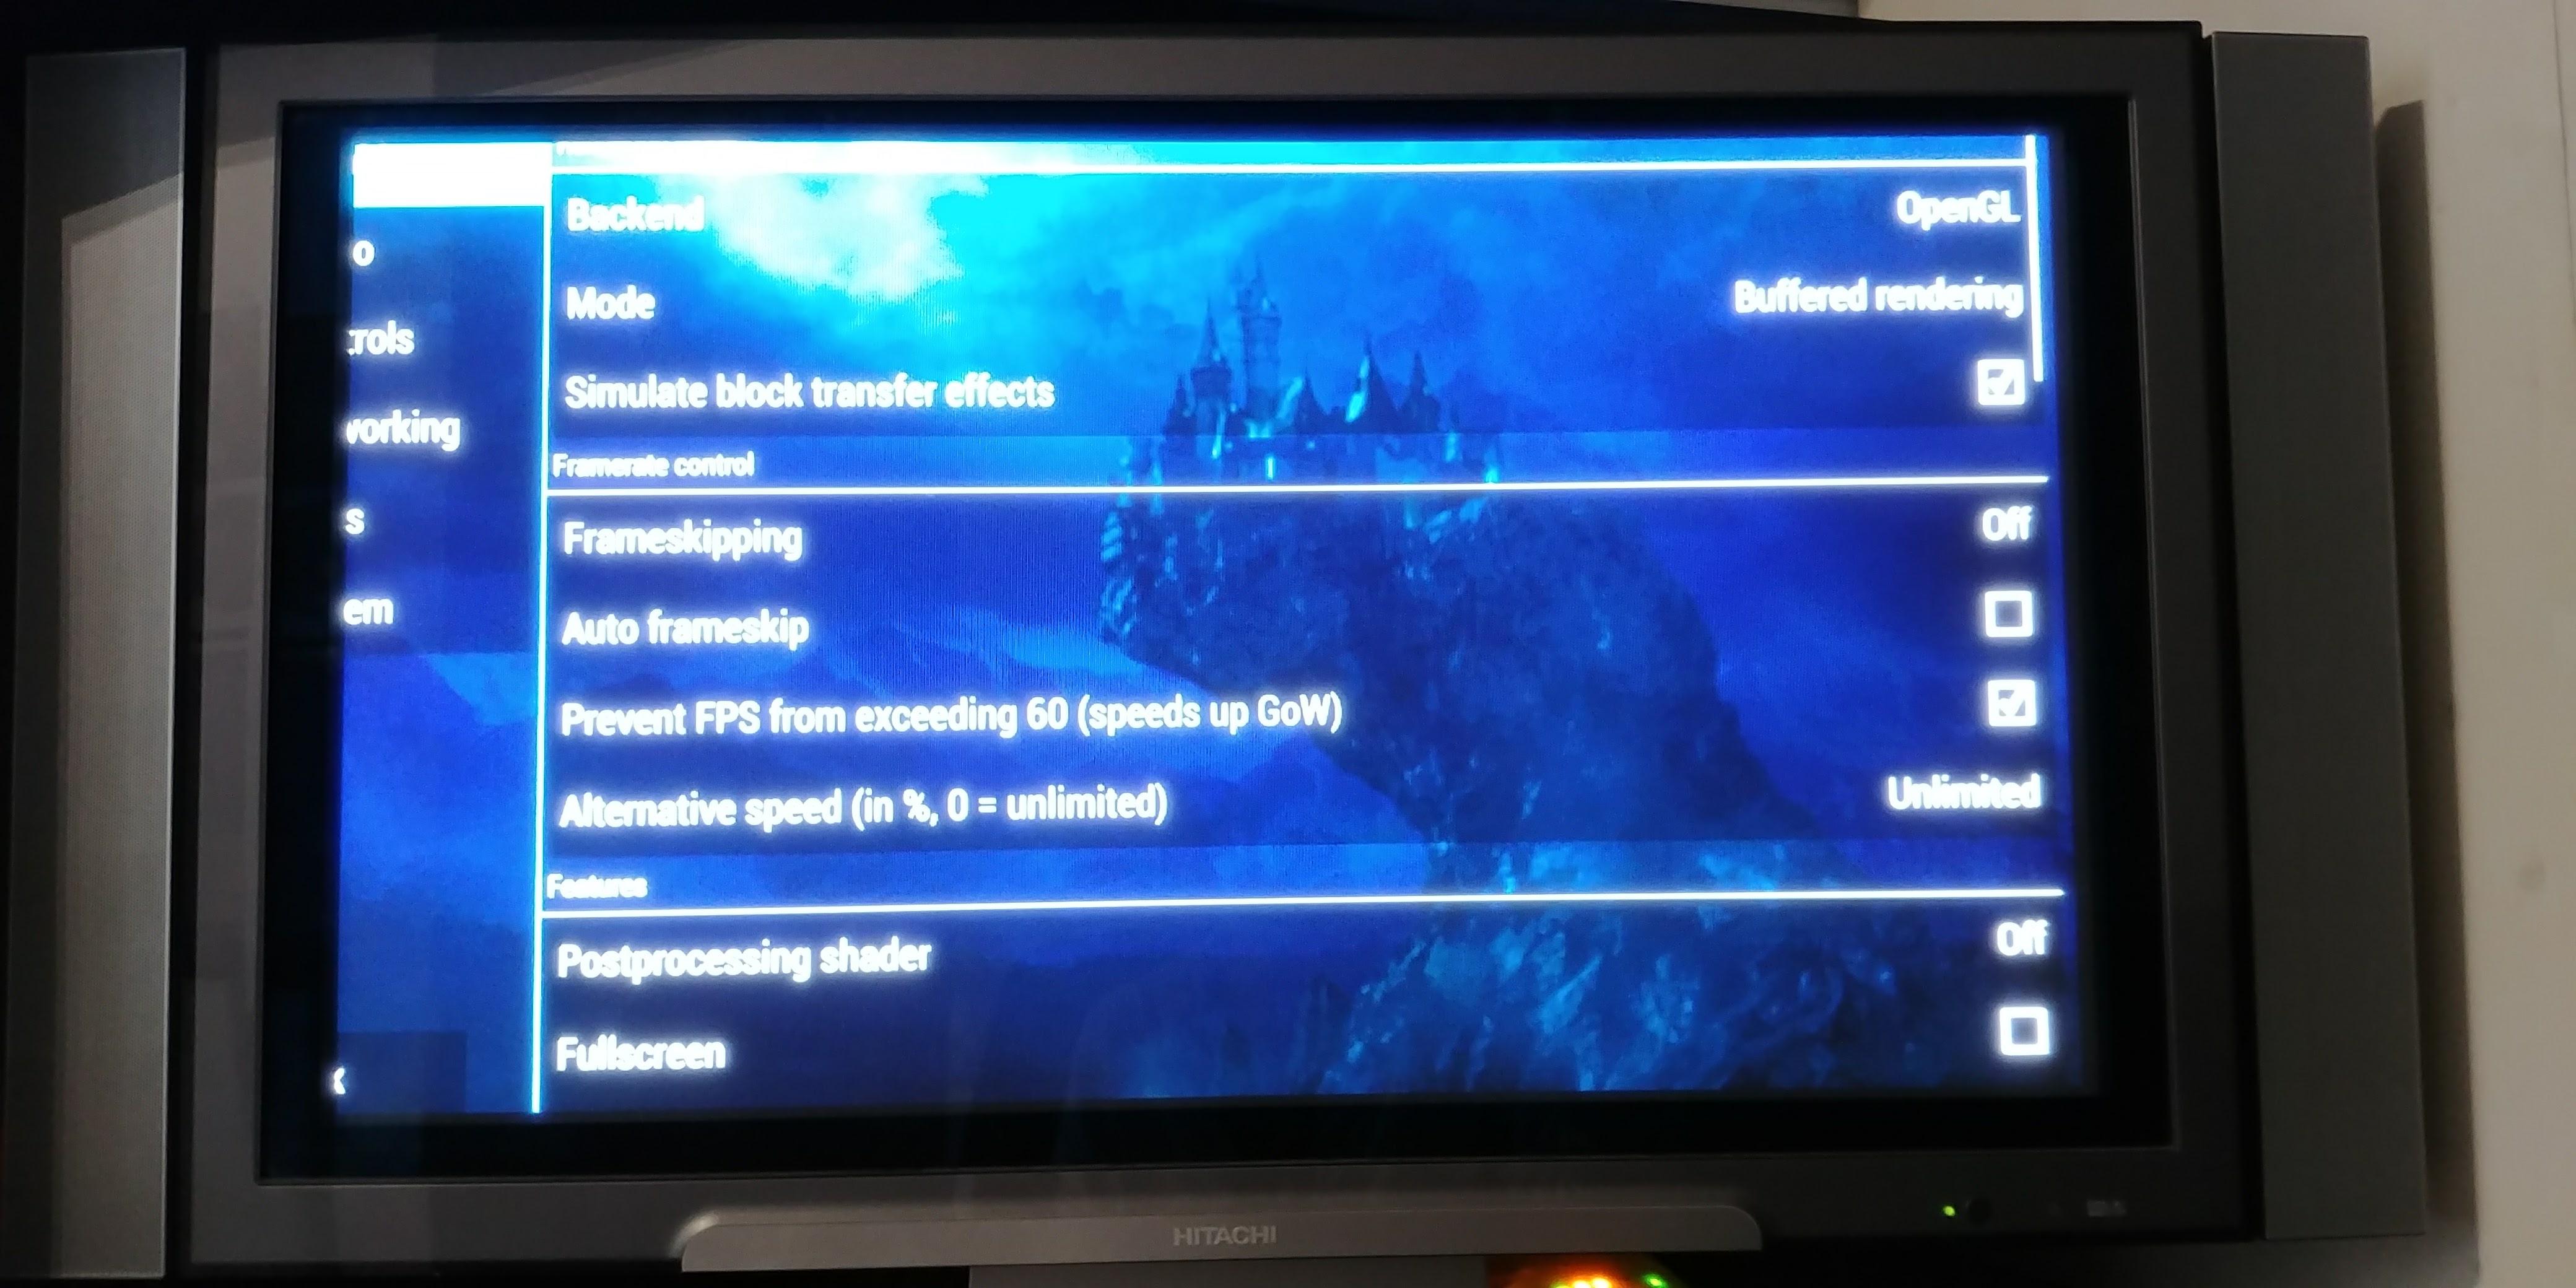 PSP x360 Controller issu fixed on Retropie <3 - RetroPie Forum